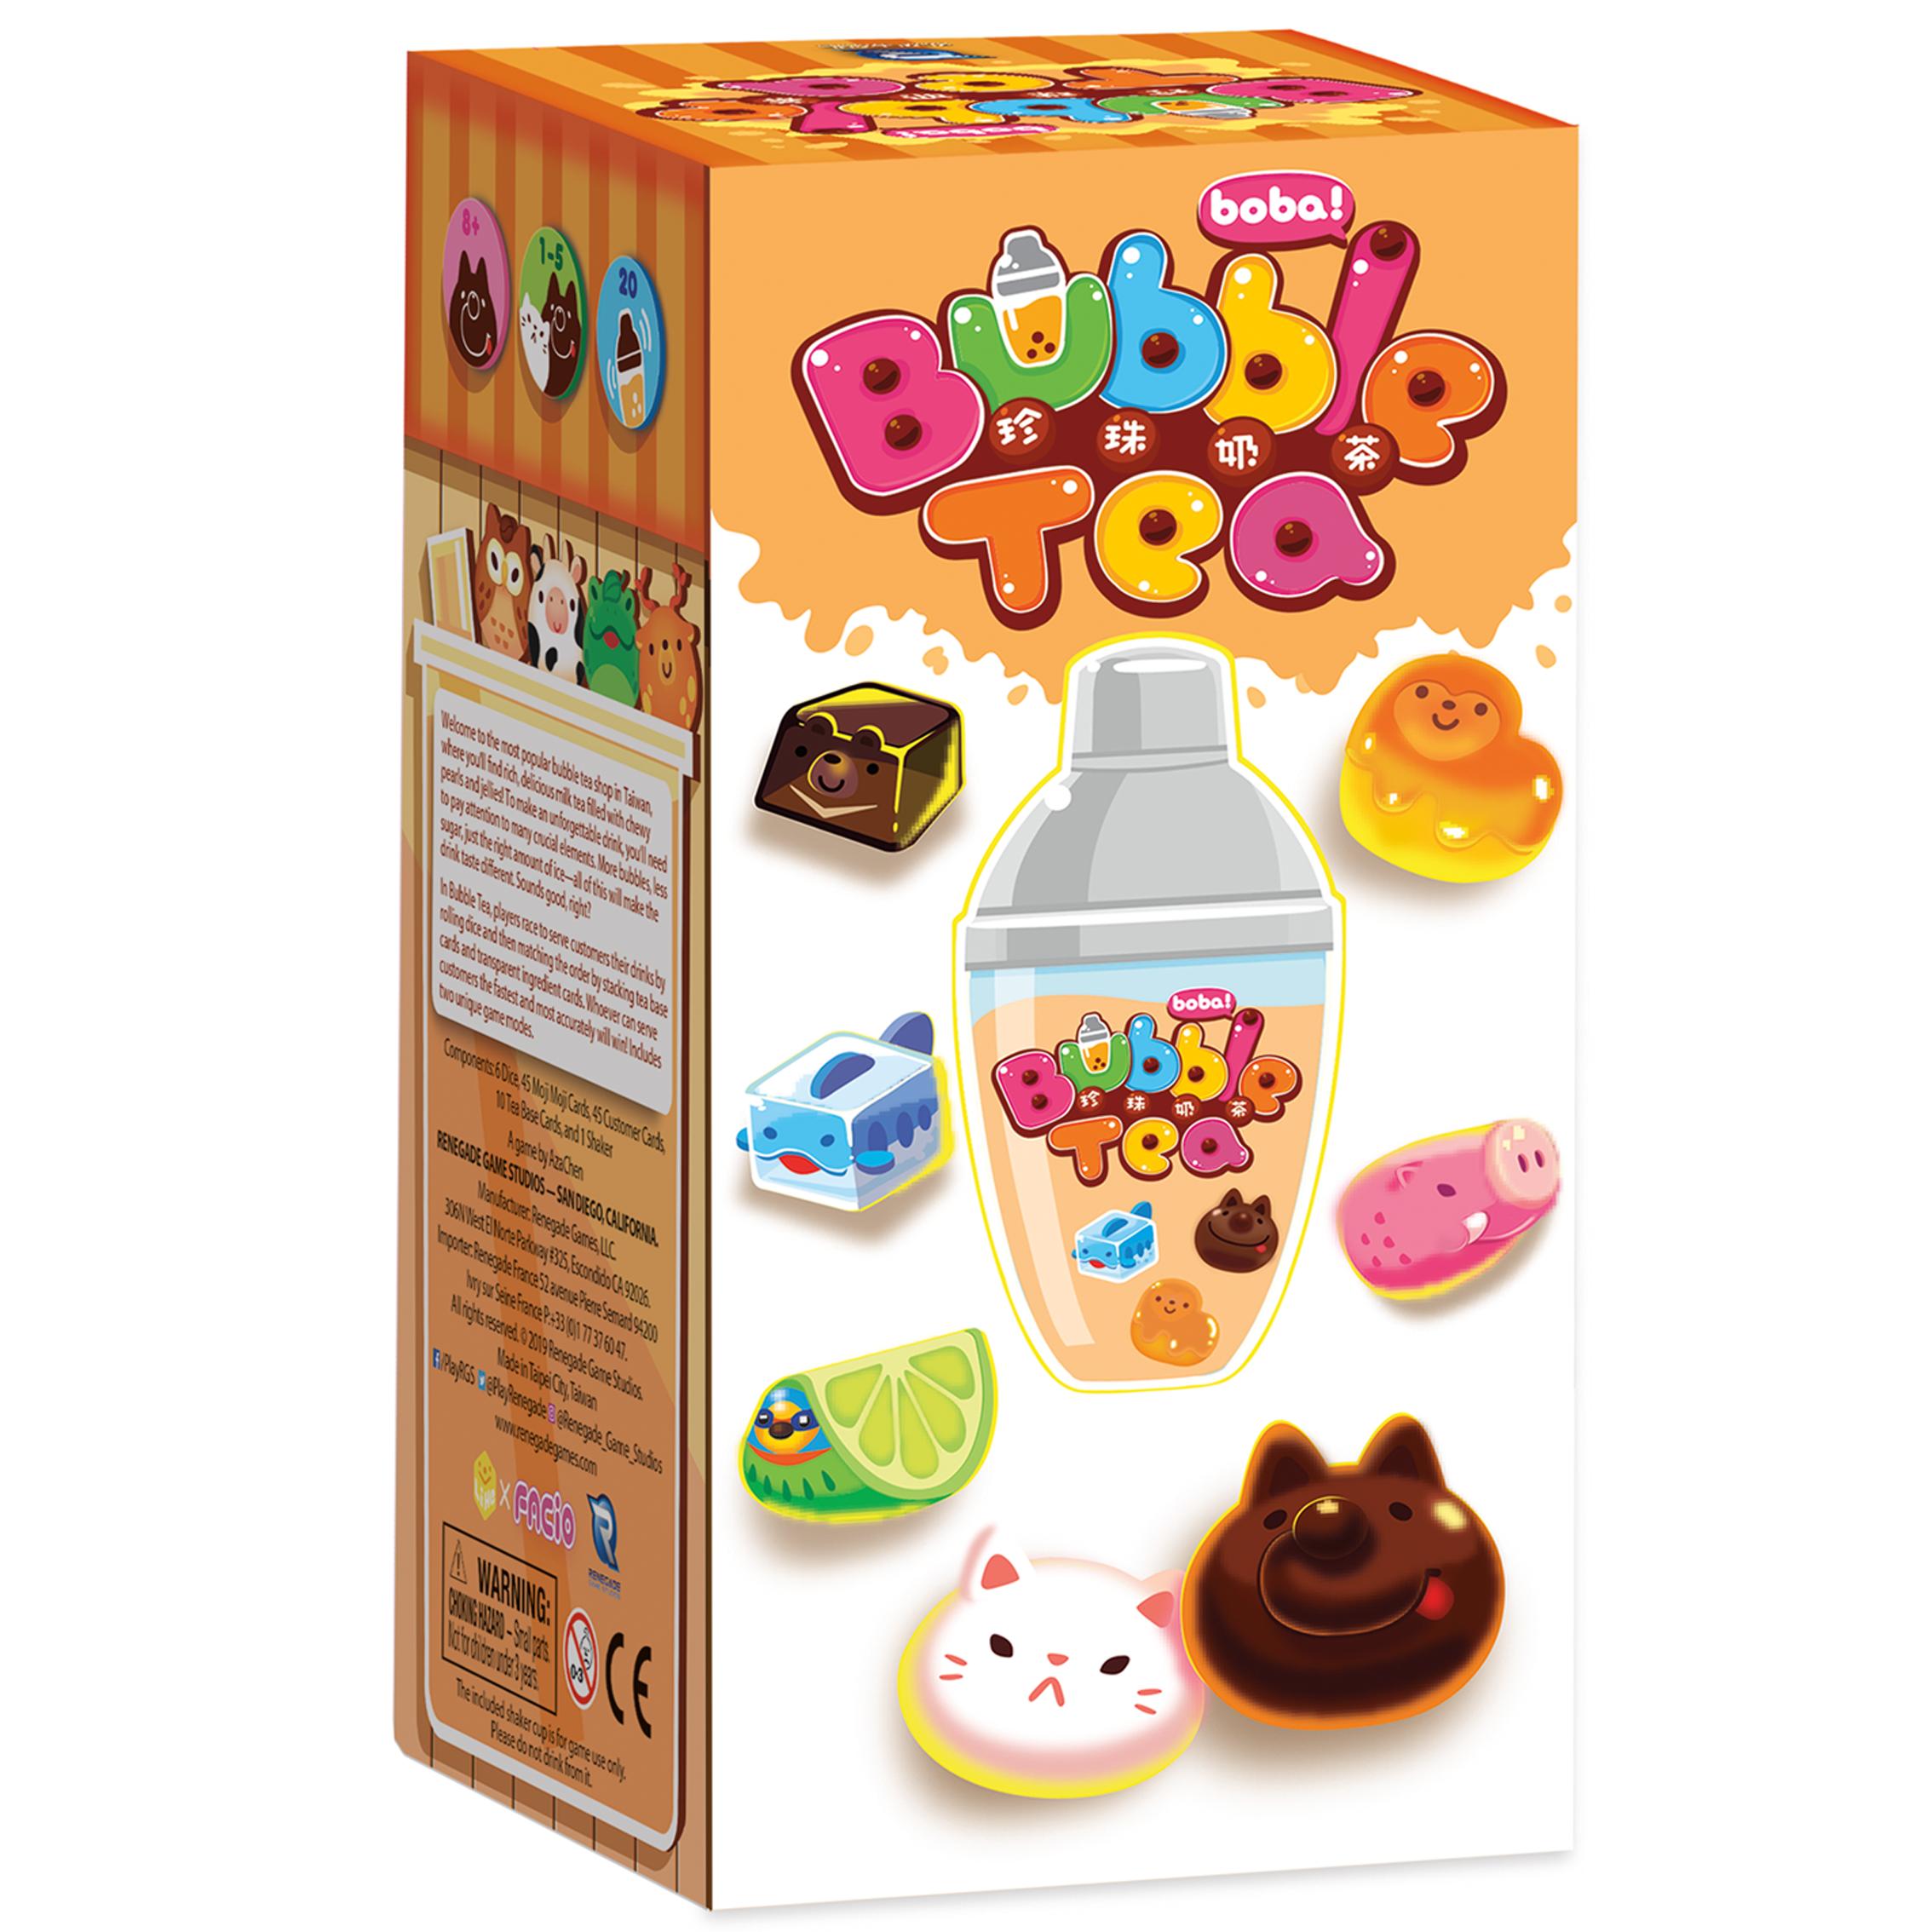 Bubble_Tea_Box_No_Shadow_small.png